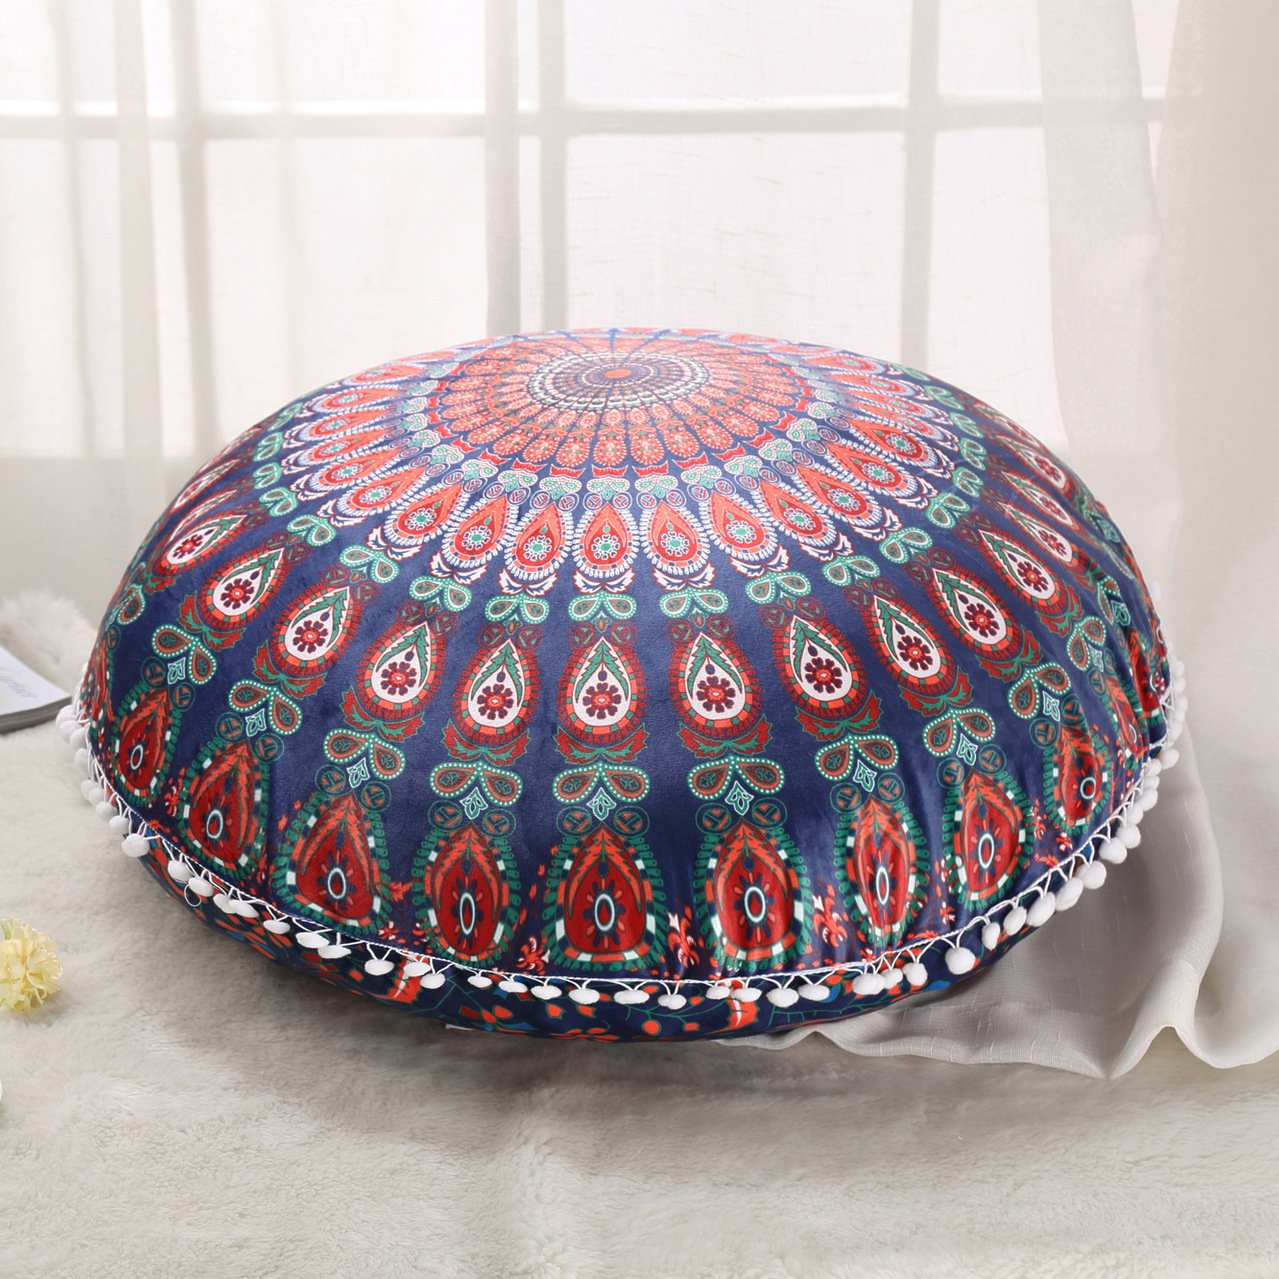 Sleepwish Large 30'' Round Pillow Cover Boho Mandala Floor Cushion Zen Meditation Pillow Case Outdoor Pom Pom Pillow Sham (Red Green)